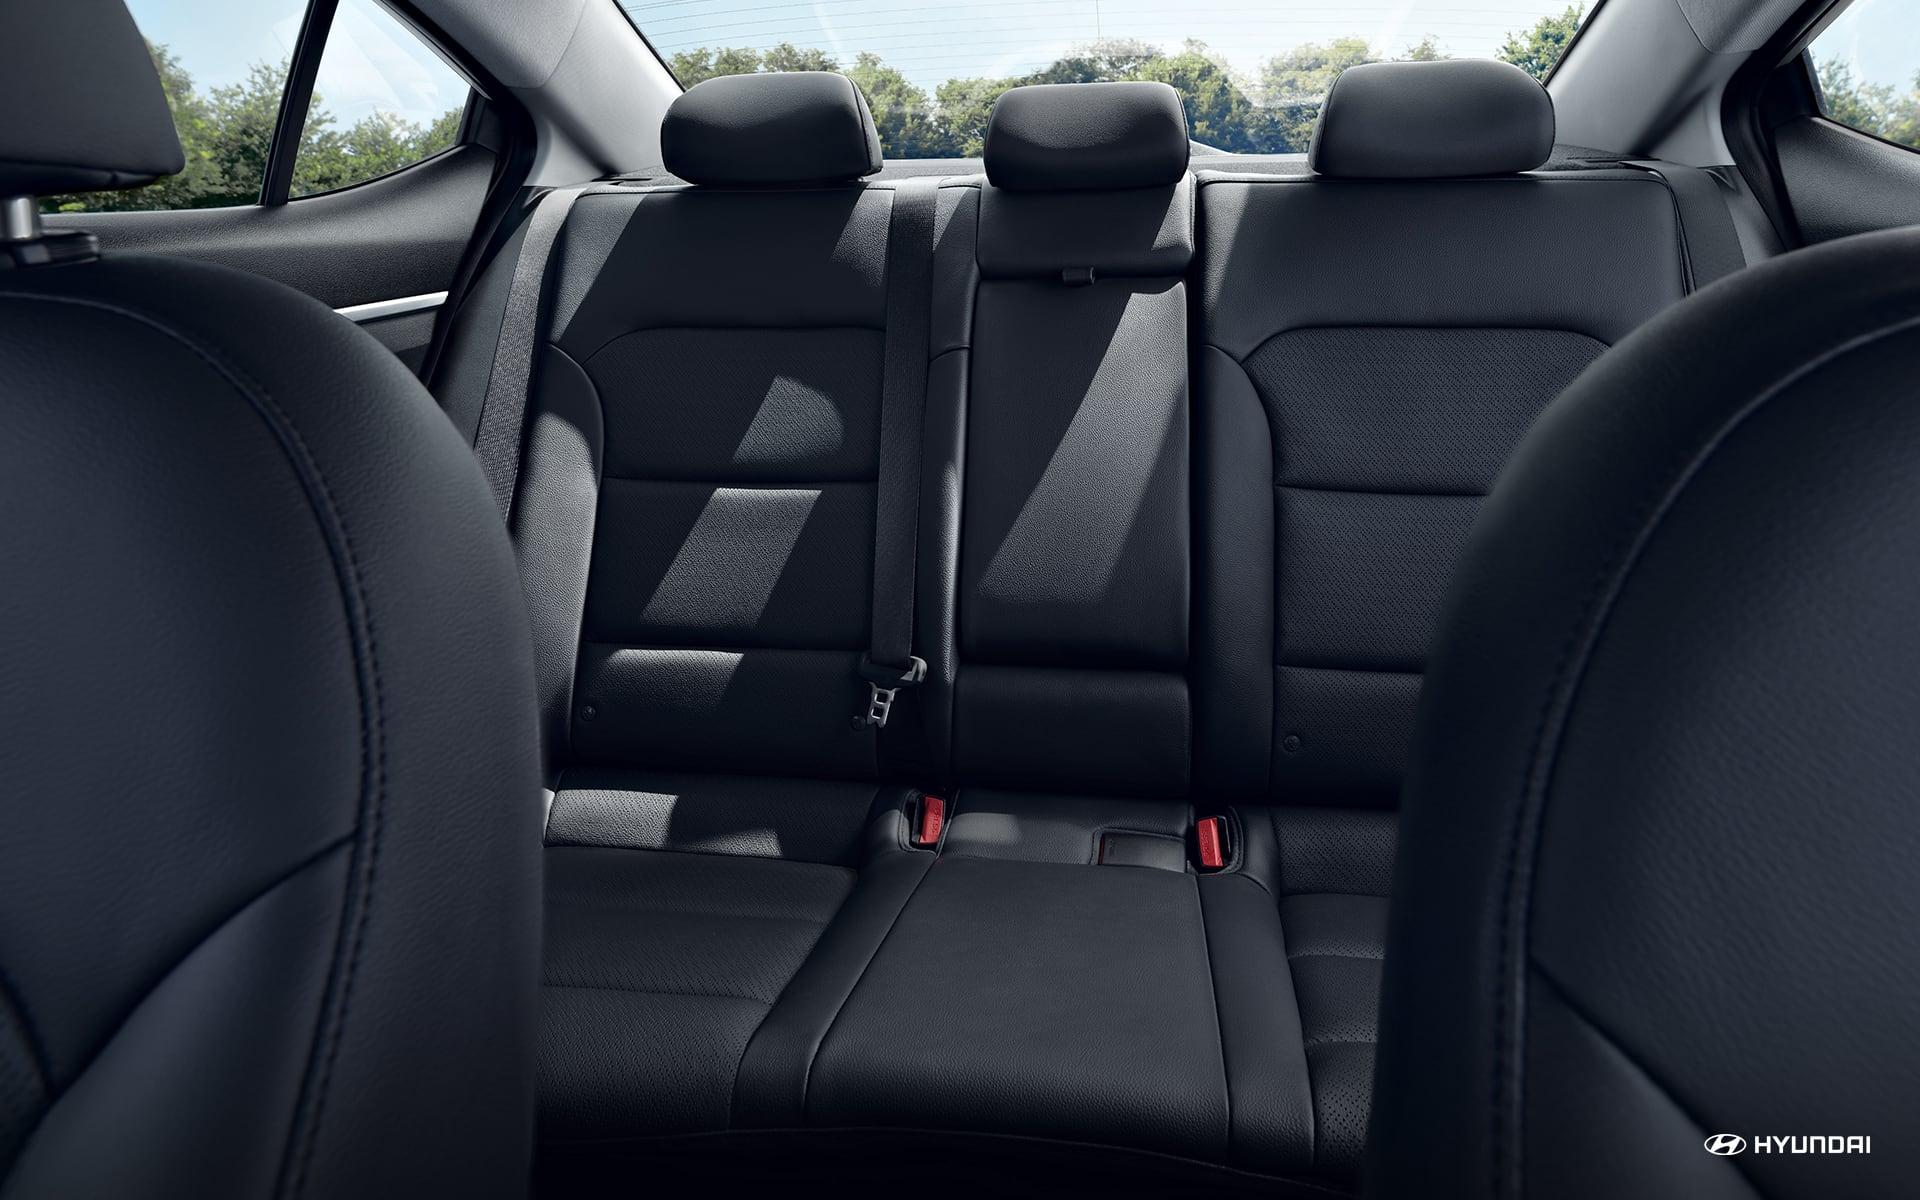 Get Comfortable in the 2020 Hyundai Elantra